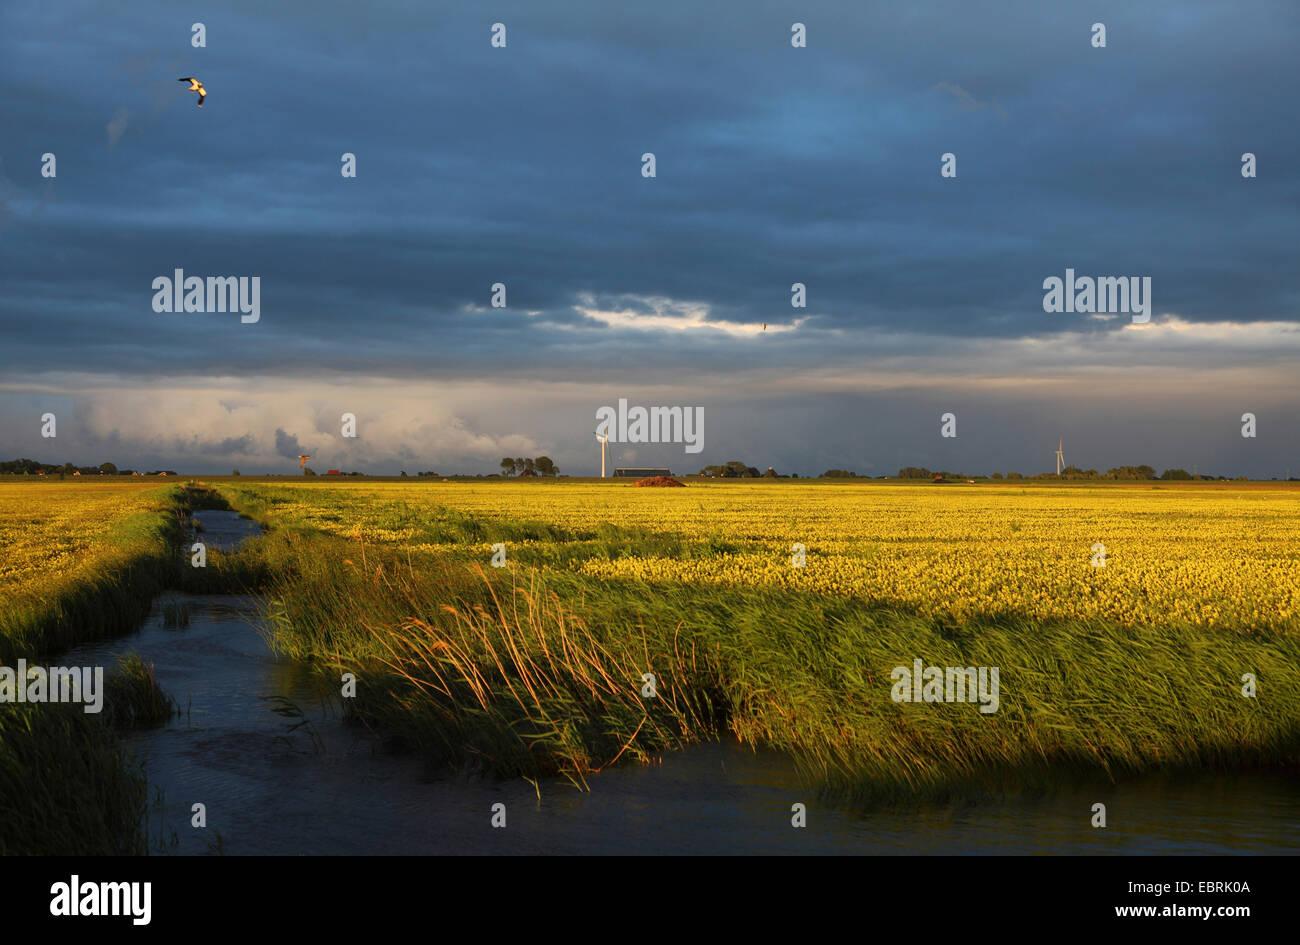 Workum Waard, evening mood after rainfall, Netherlands, Frisia - Stock Image